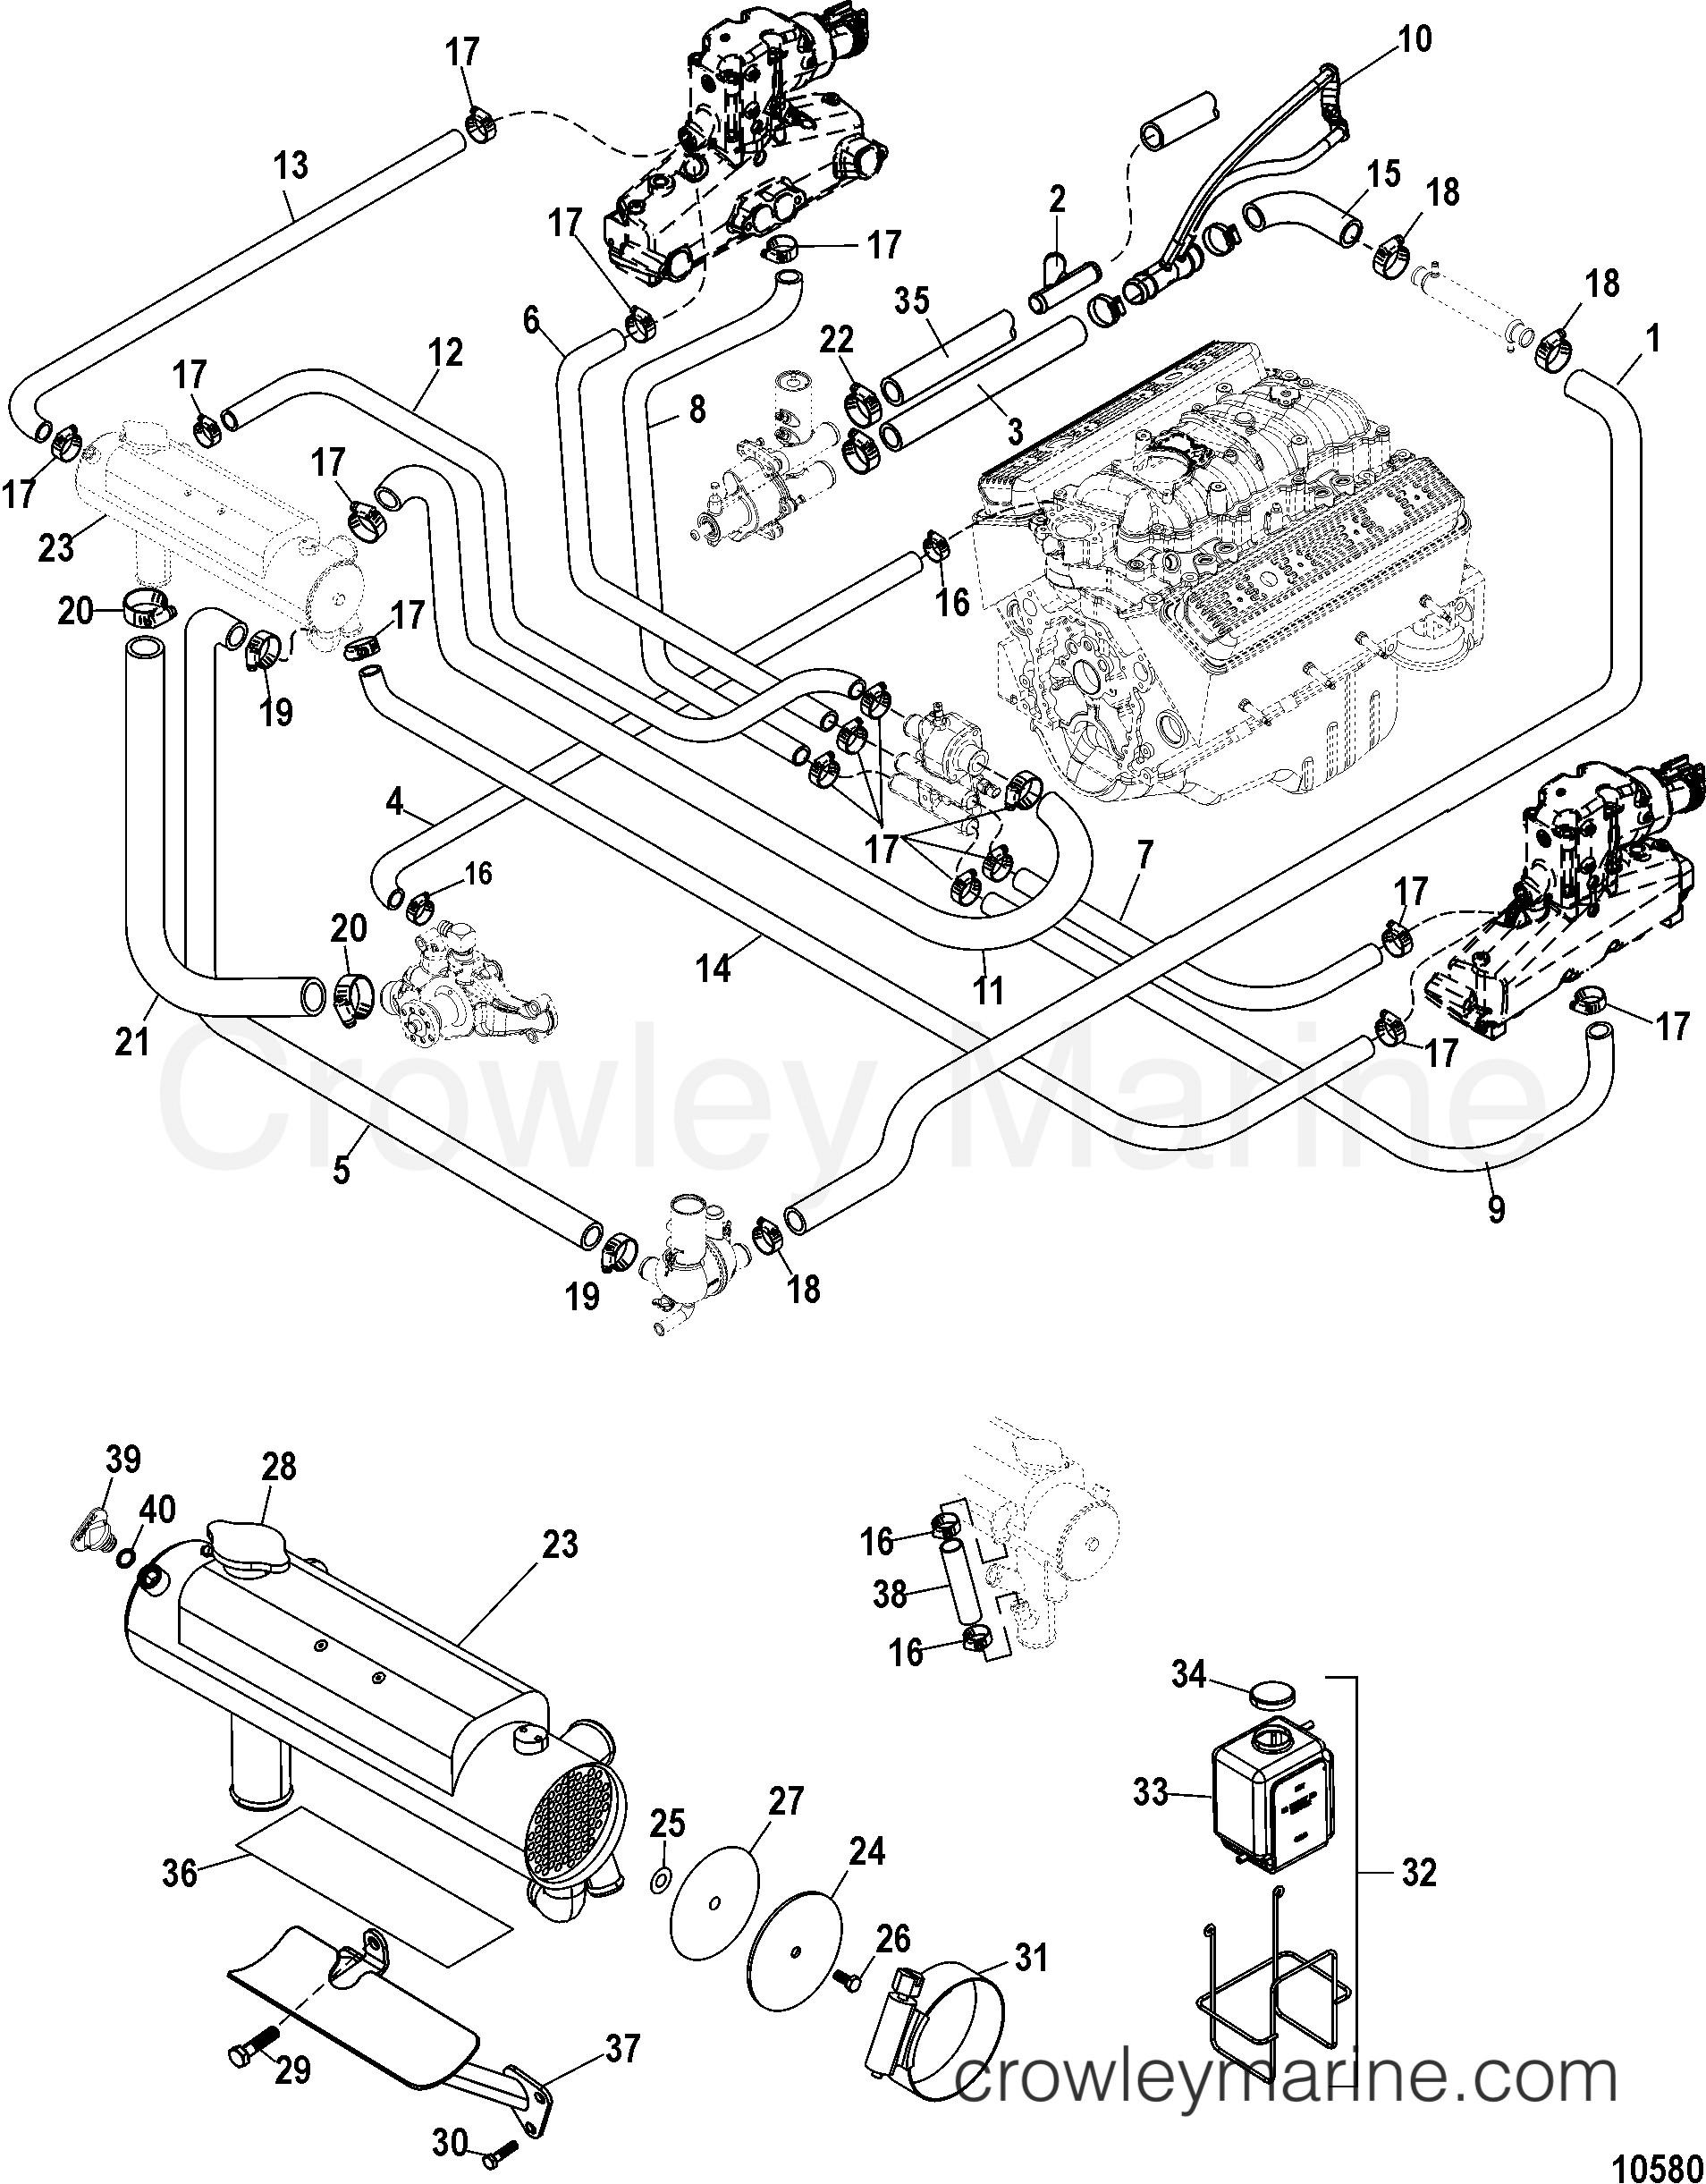 Marine Engine Cooling System Diagram Closed Cooling System Serial Range Mercruiser Mx 6 2l Mpi Mie Of Marine Engine Cooling System Diagram